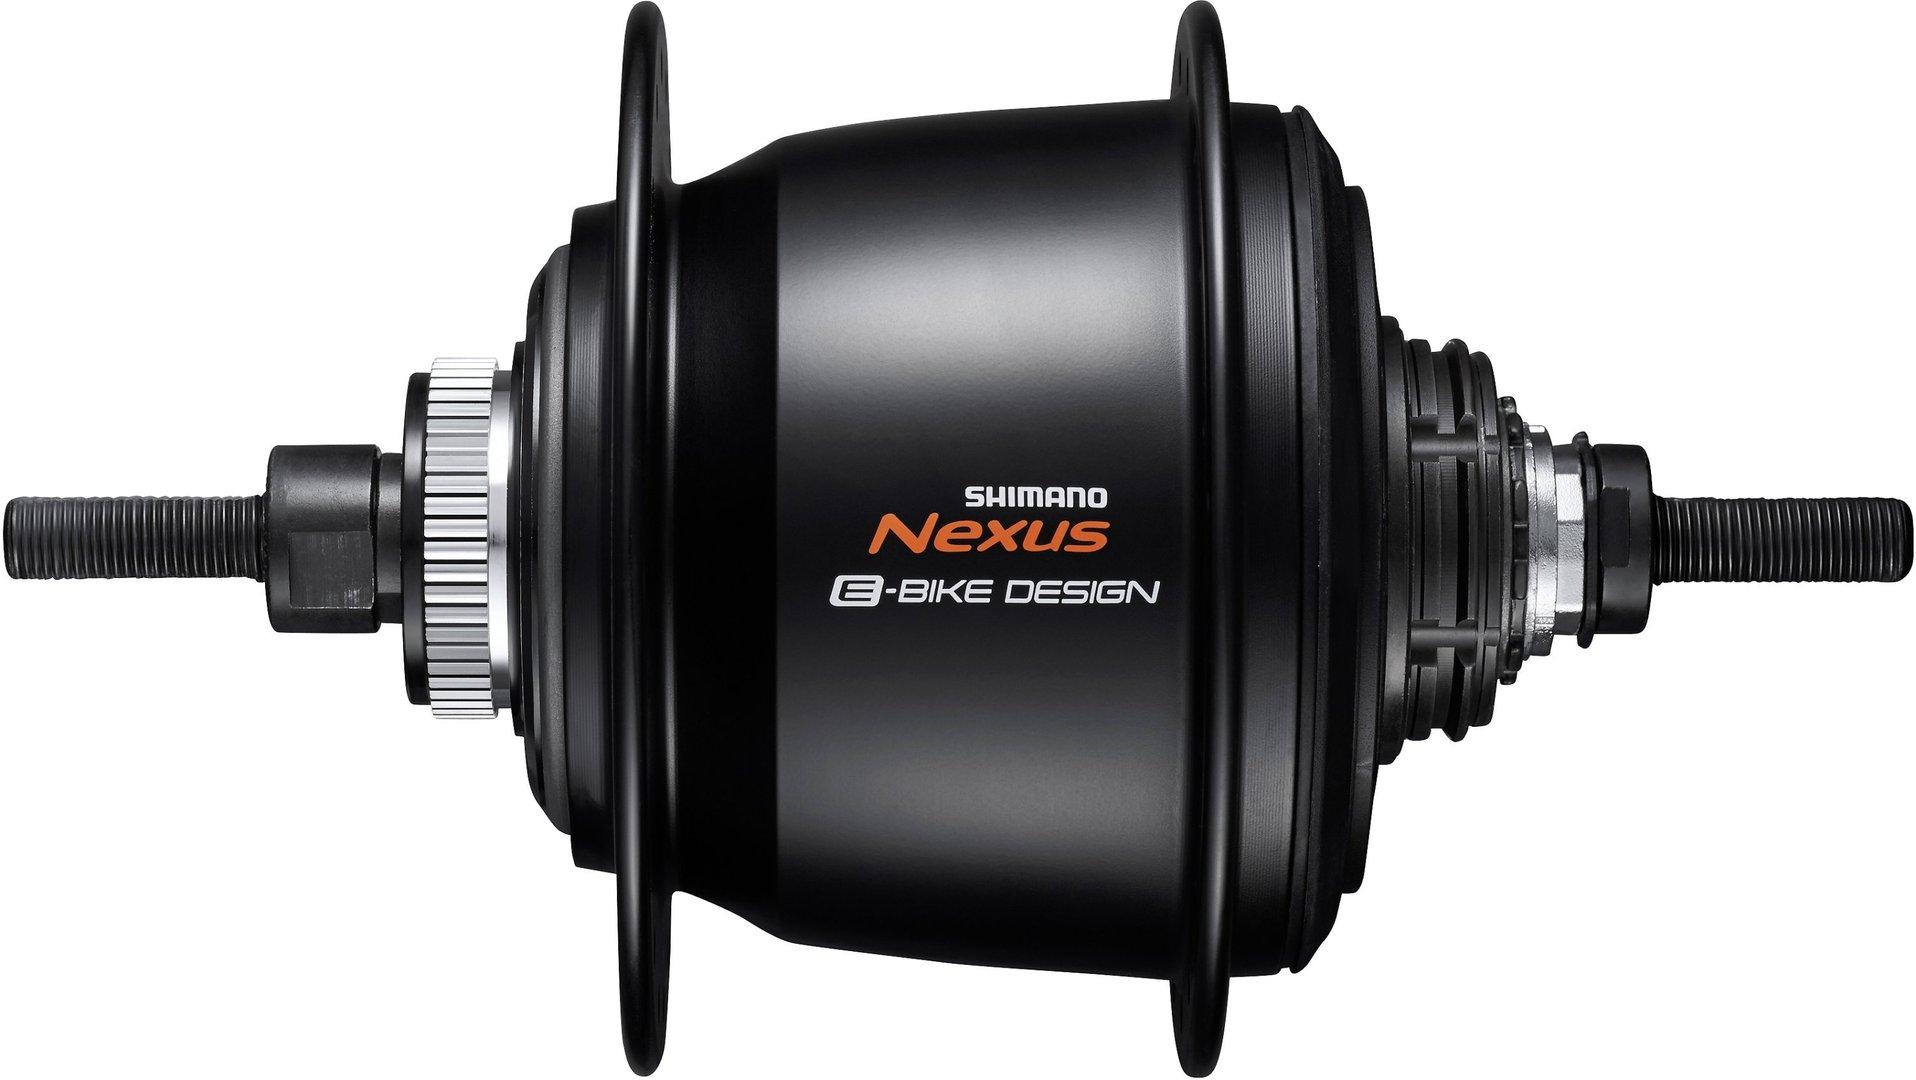 Запчасть Shimano C7000, 5ск, Nexus (ISGC70005VAL) цена